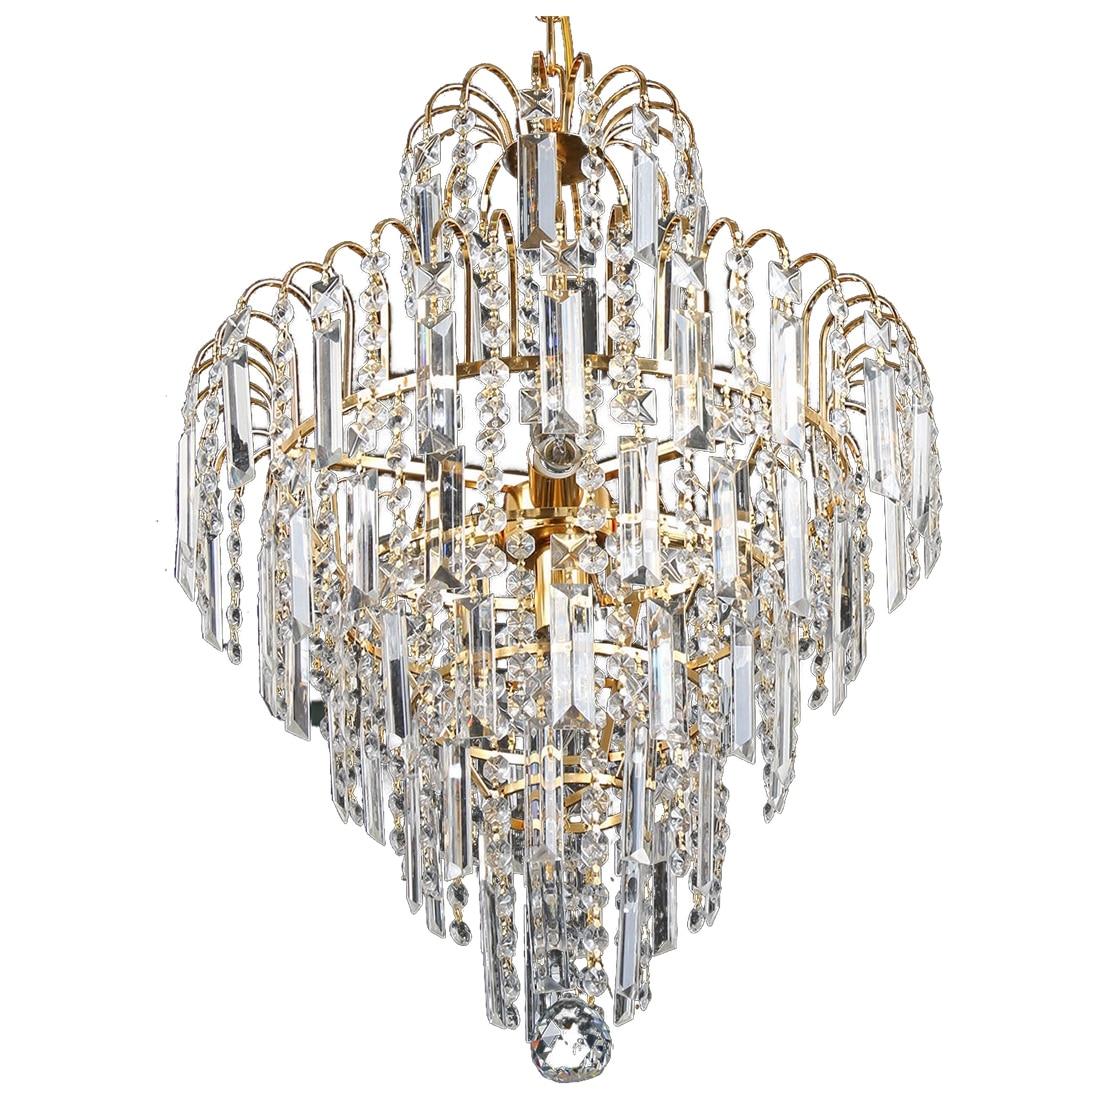 BIFI-Luxury Big Crystal Chandelier Modern Ceiling Light Lamp Pendant Lighting Fixture luxury big crystal modern ceiling light lamp lighting fixture